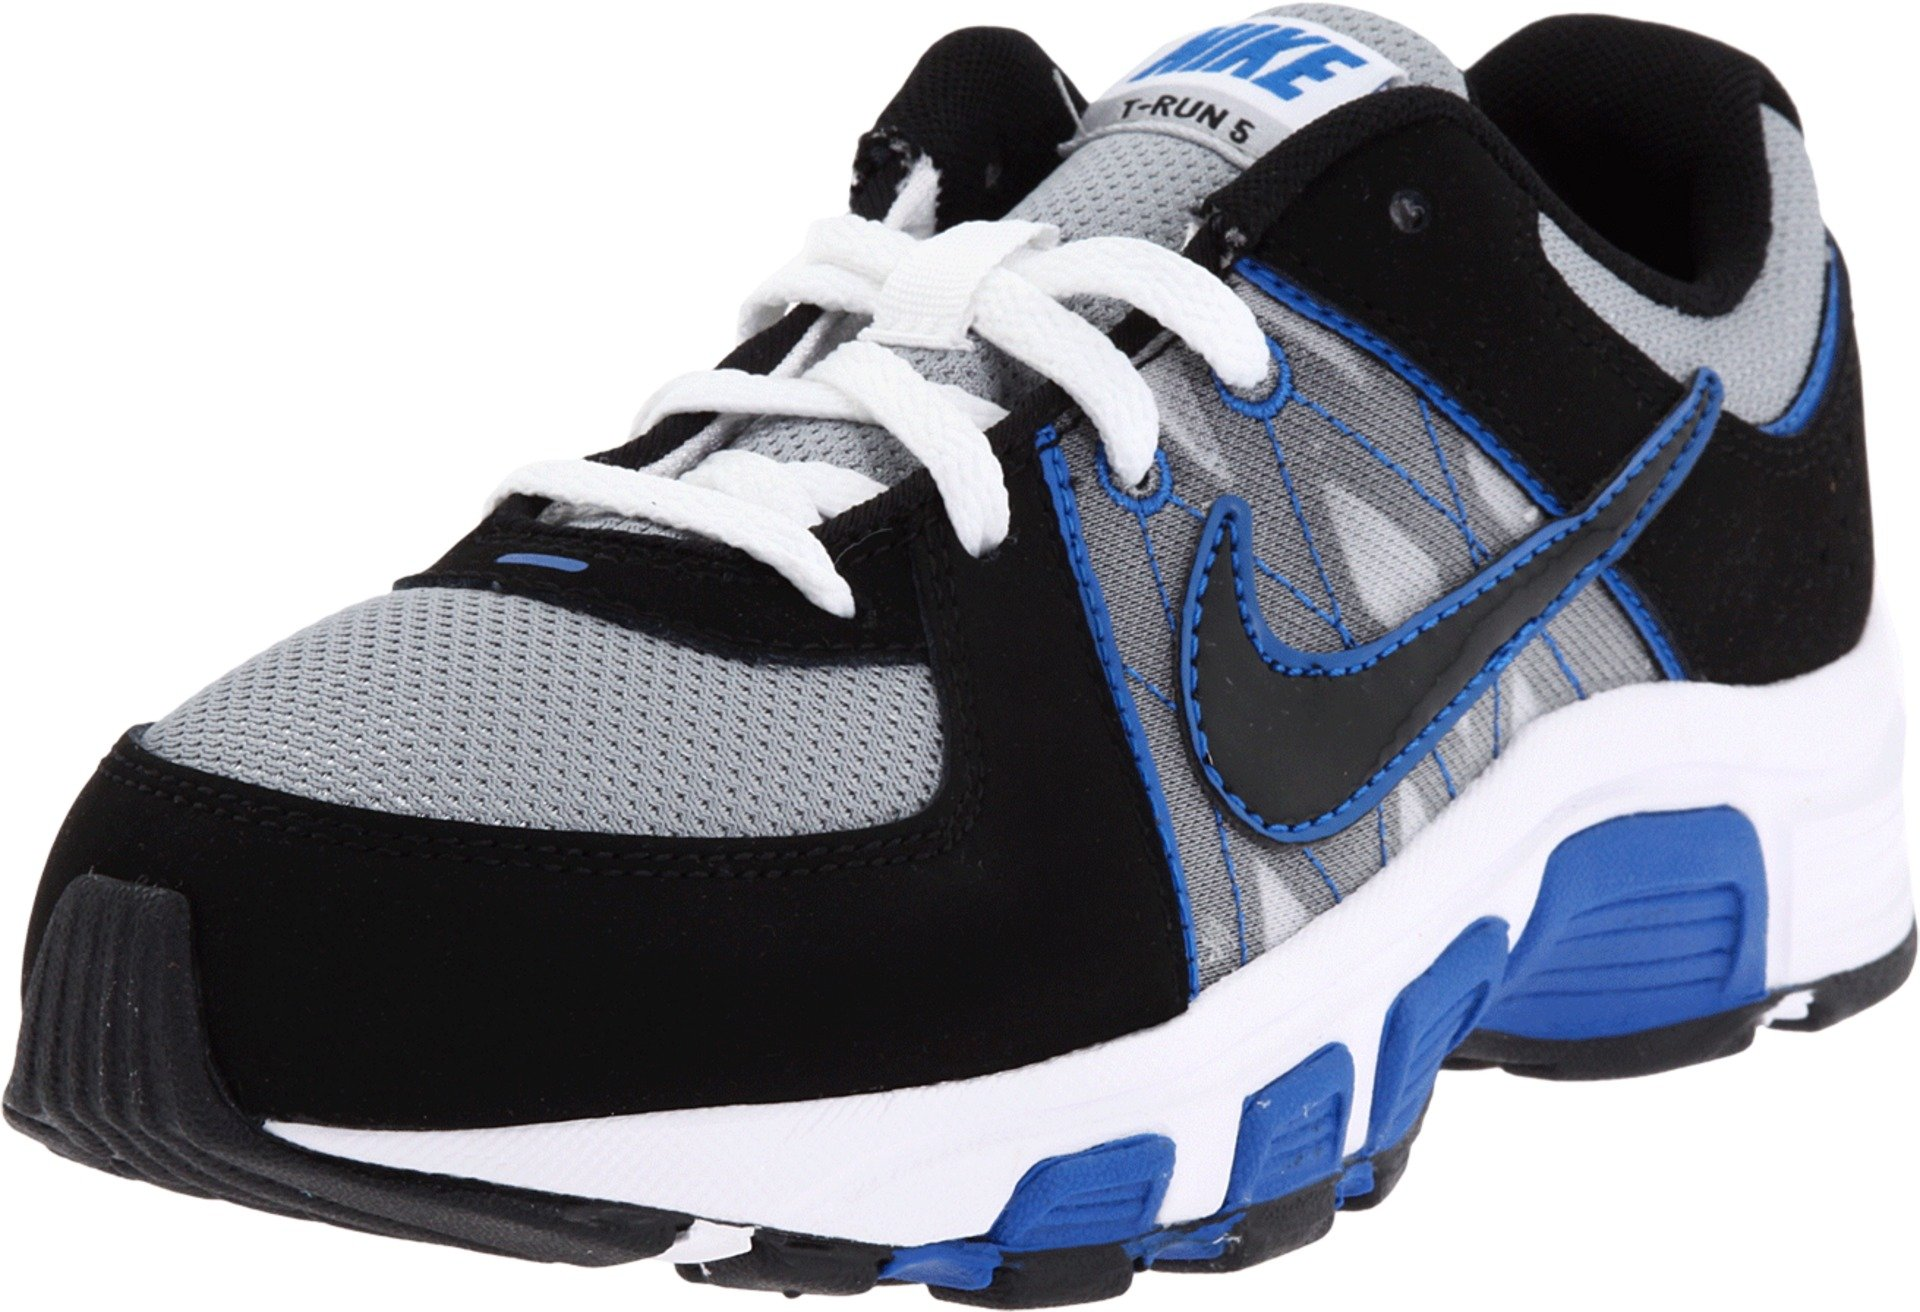 NIKE Presto Extreme Big Kids Style : 870020-404 Size : 7 Y US by Nike